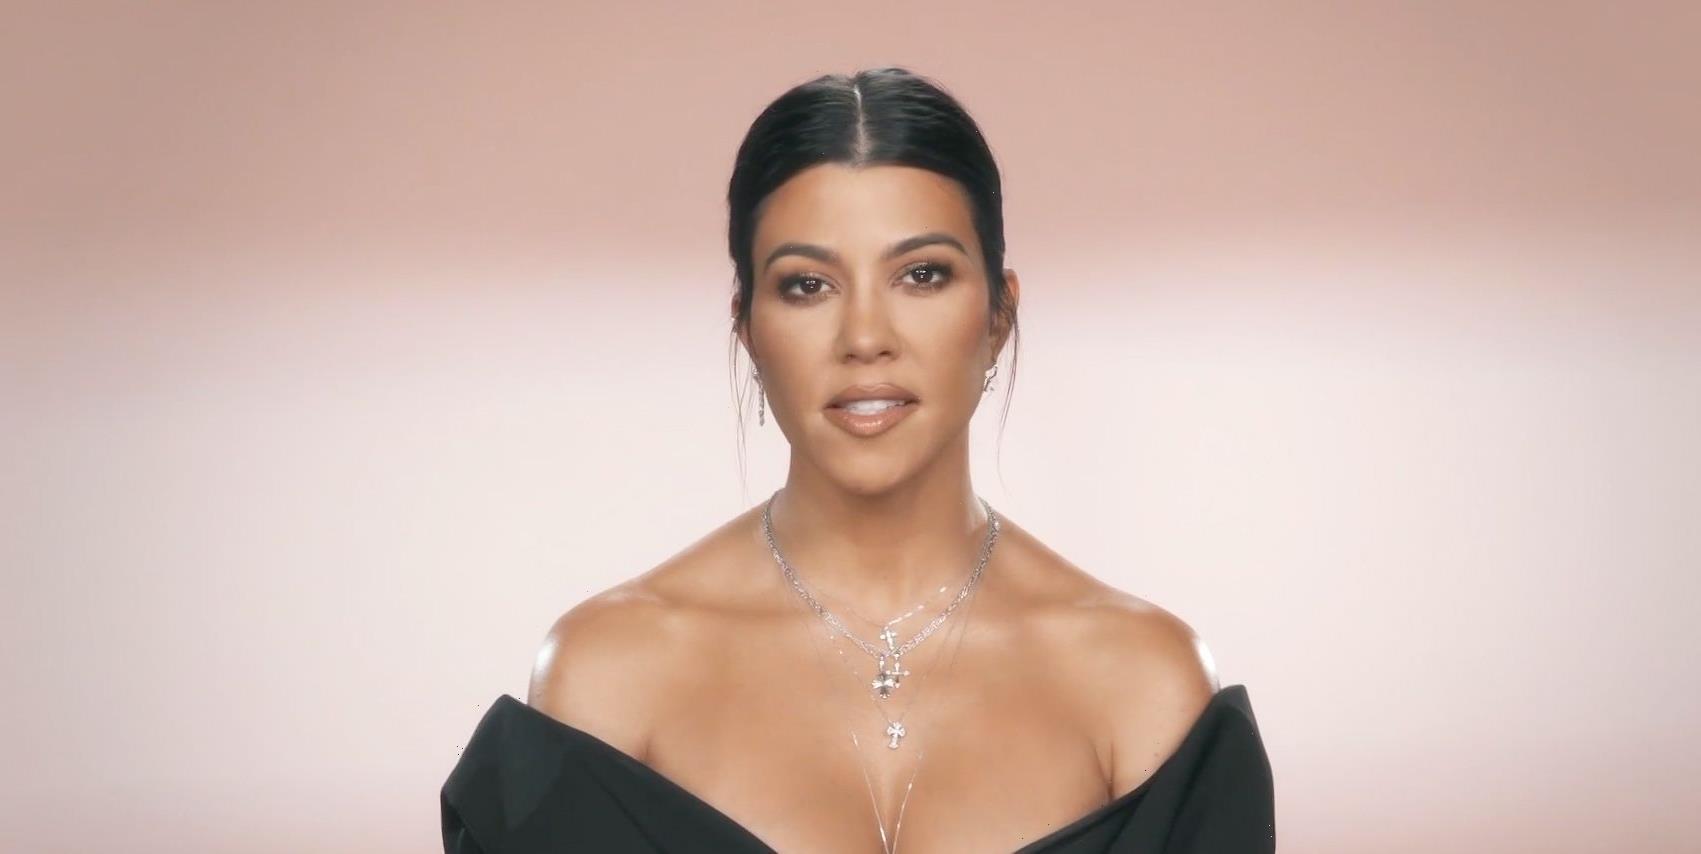 Kourtney Kardashian Got Her Hair Cut Again and It Looks So Chic